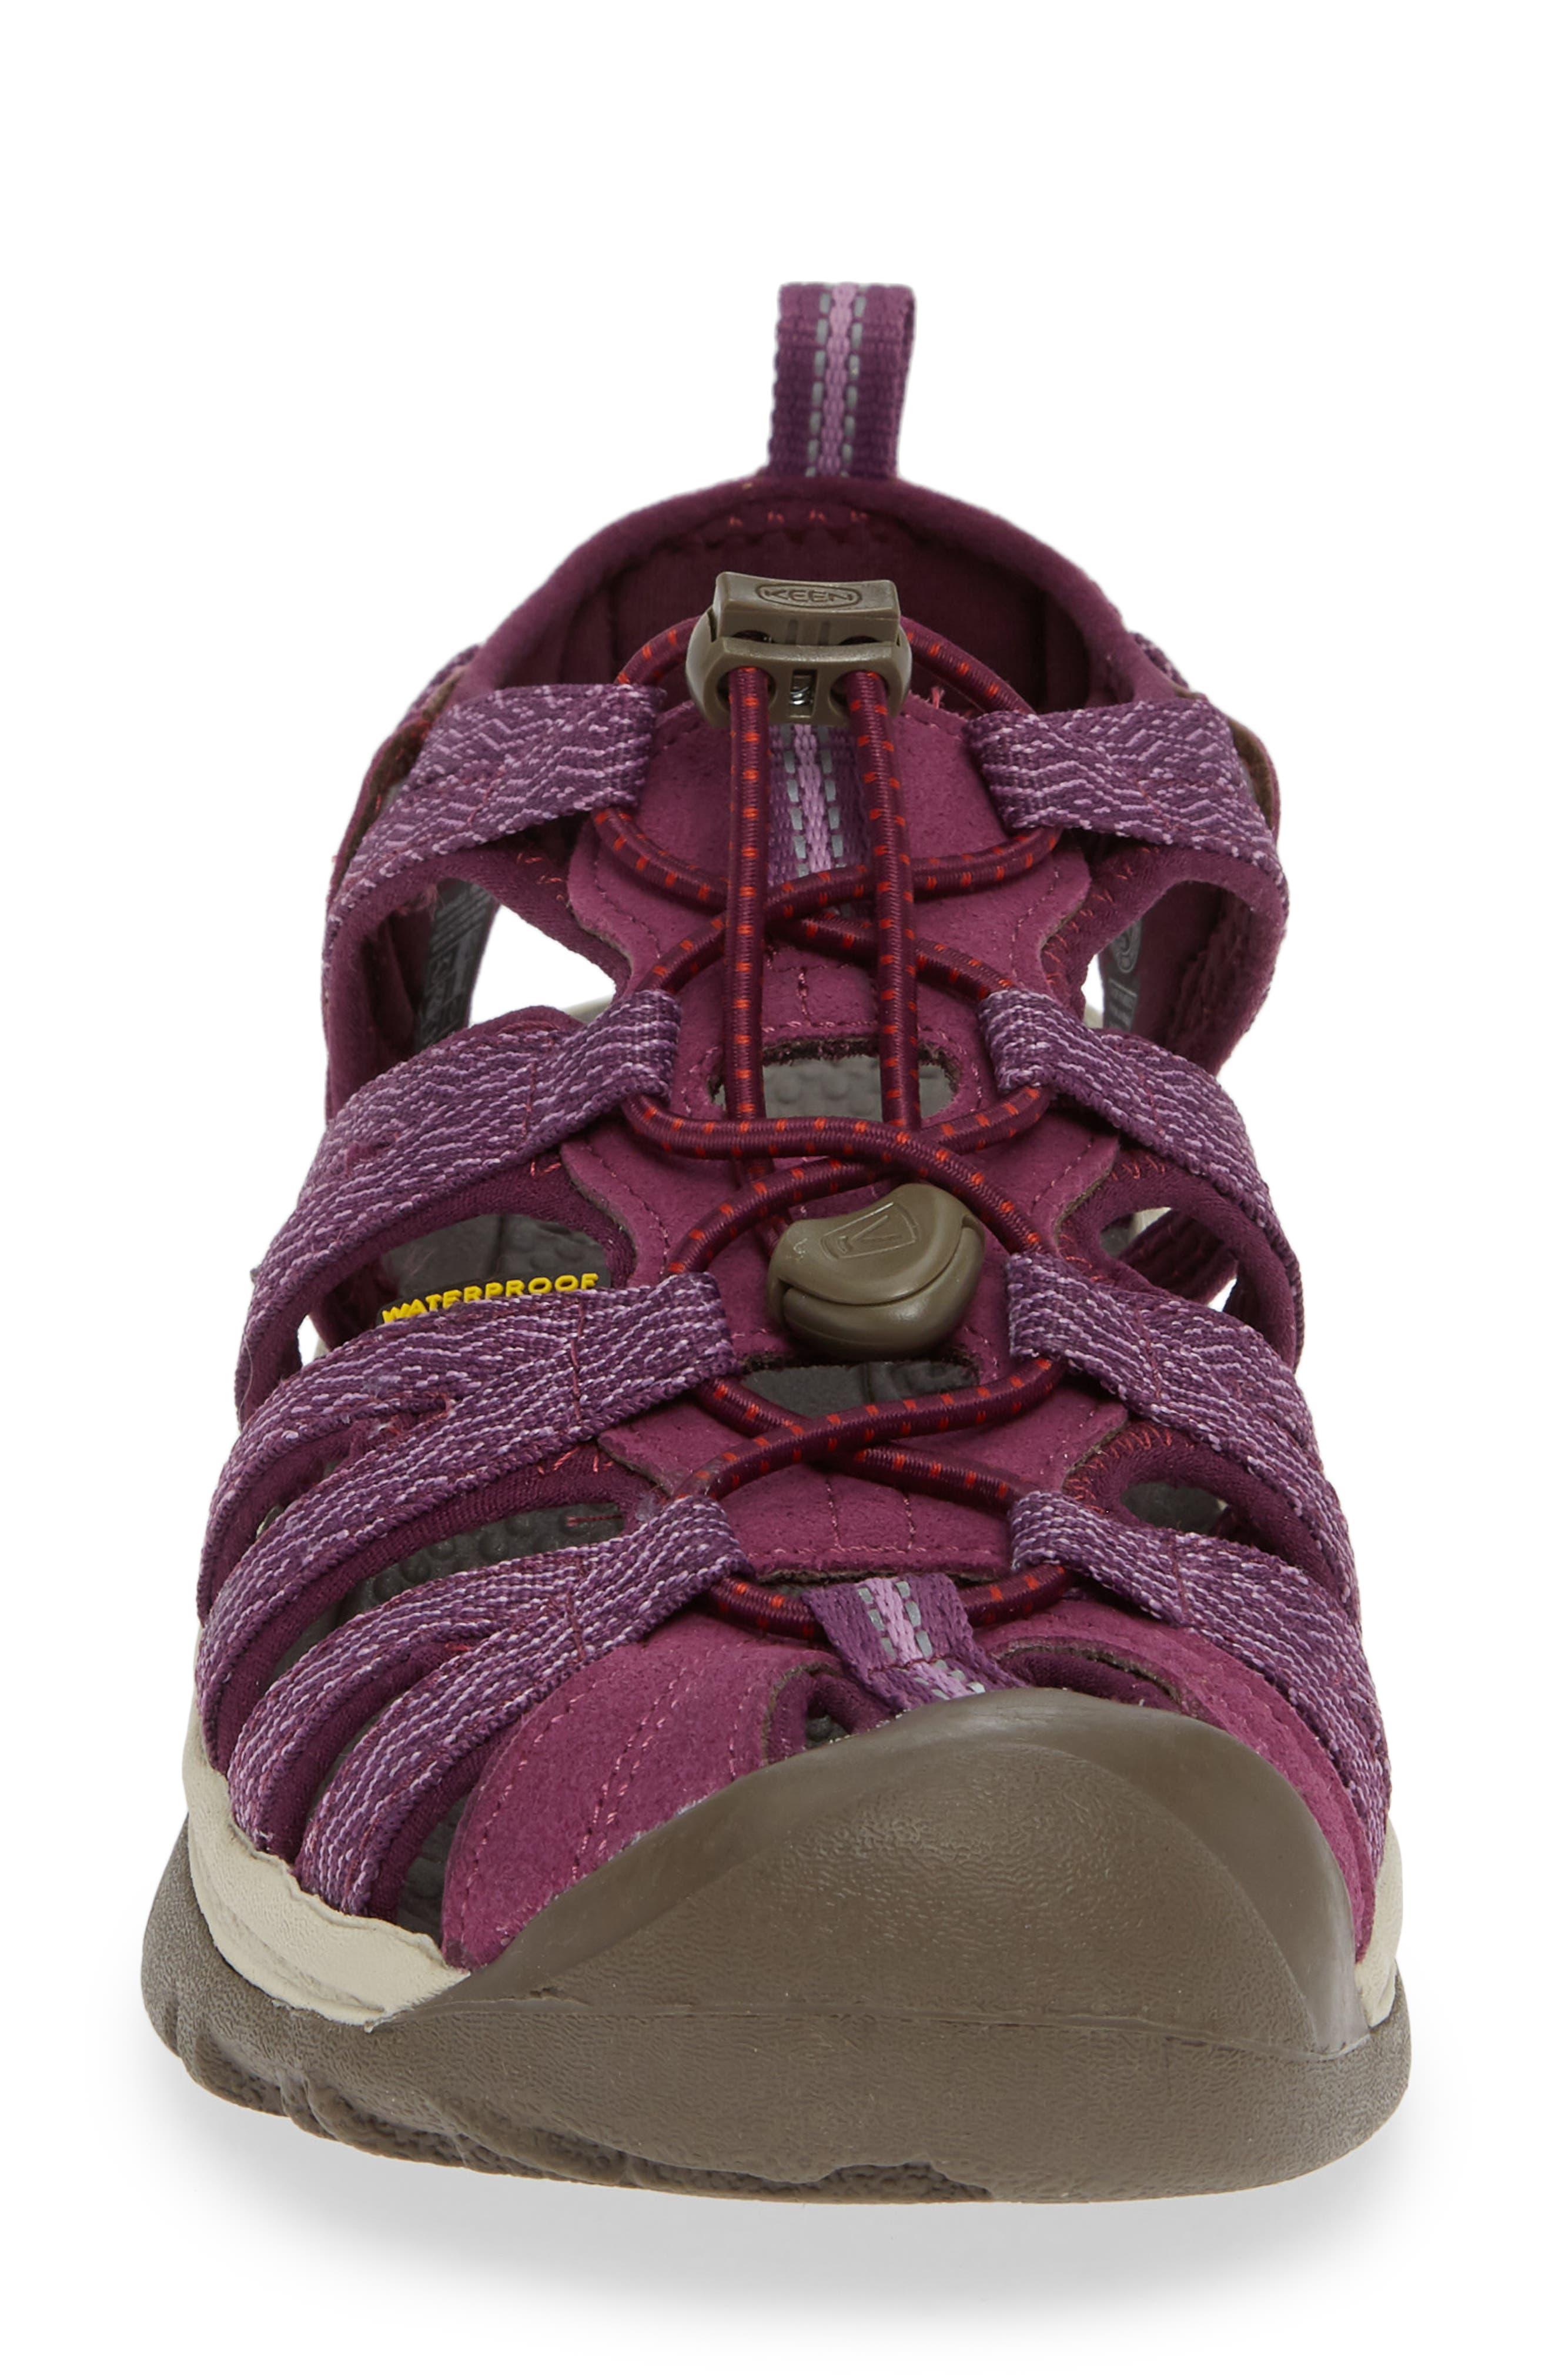 'Whisper' Water Friendly Sport Sandal,                             Alternate thumbnail 4, color,                             Grape Kiss/ Grape Wine